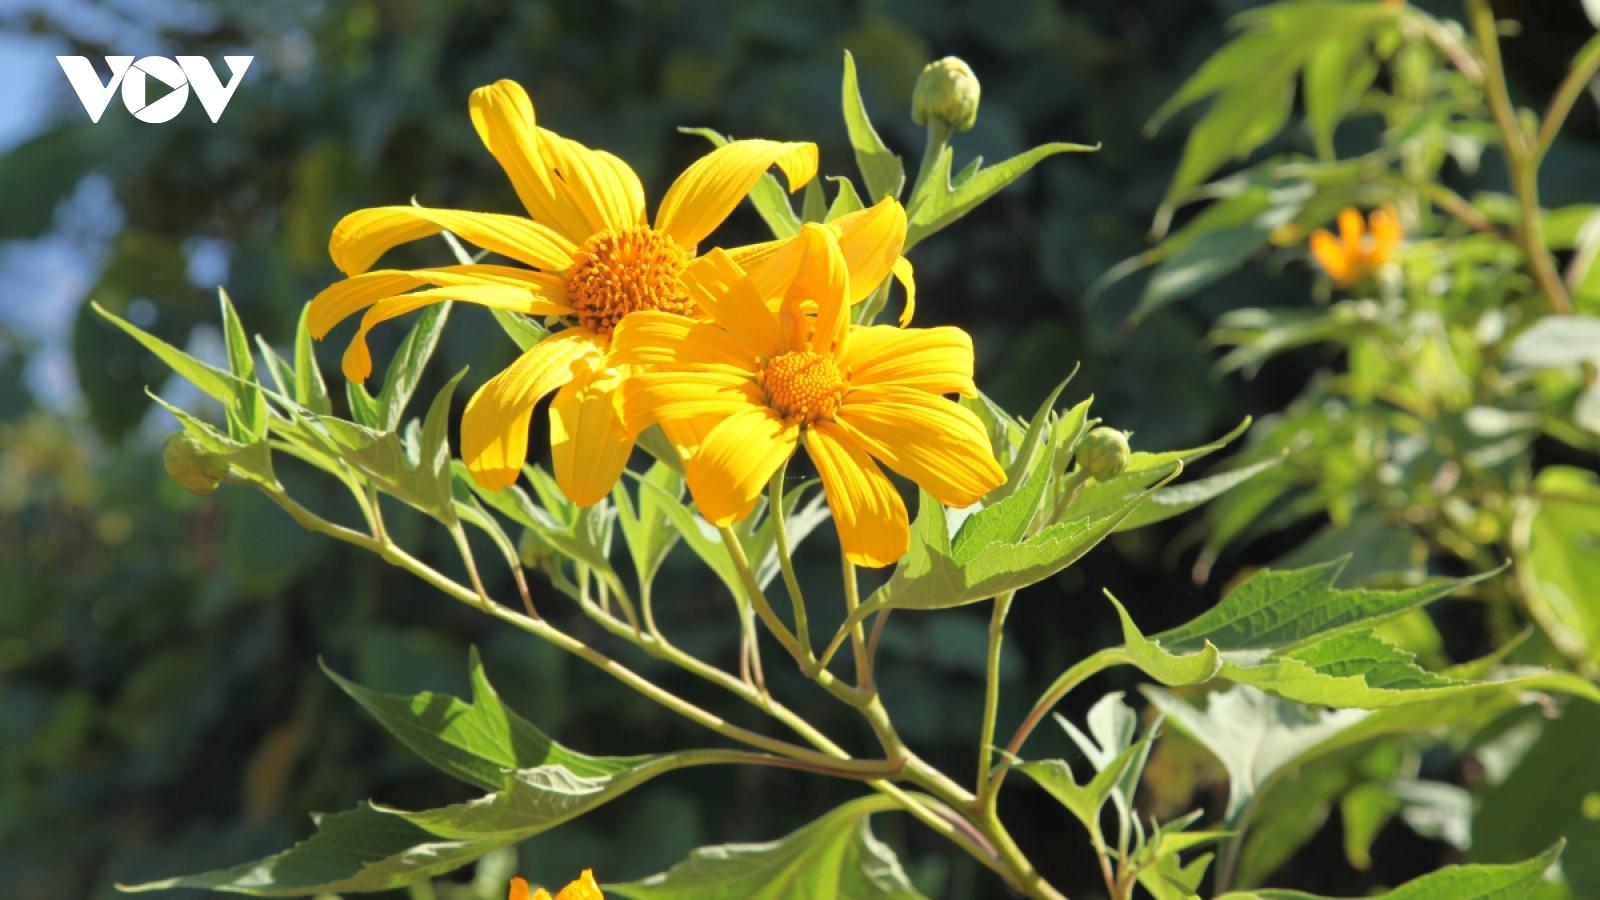 Wild sunflowers paint Dien Bien province bright yellow